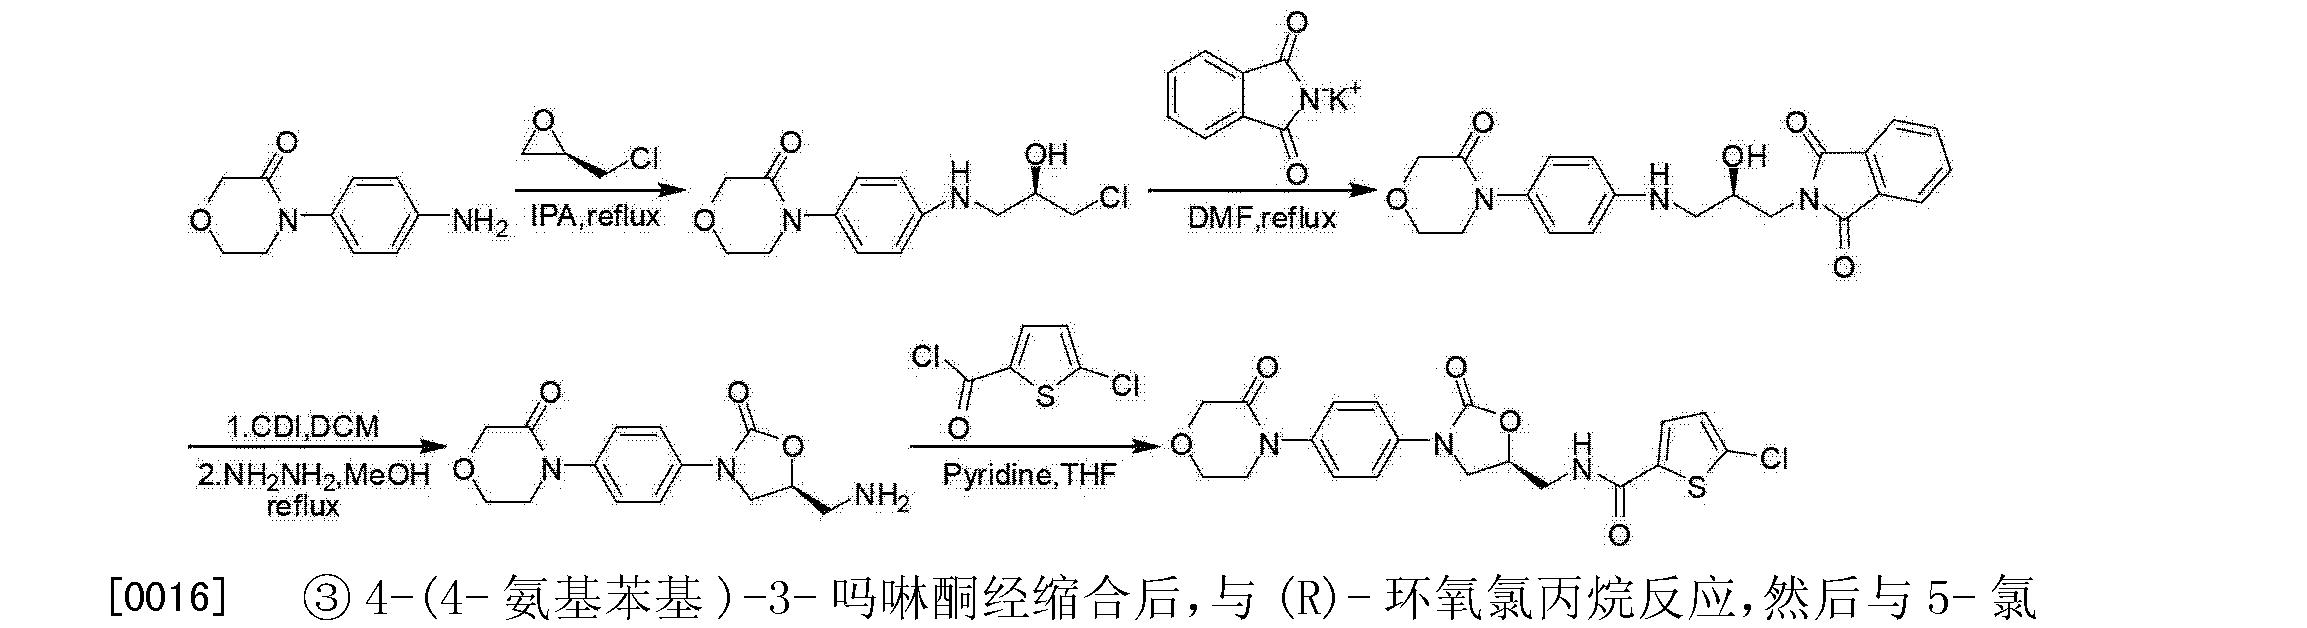 Figure CN102702186AD00053